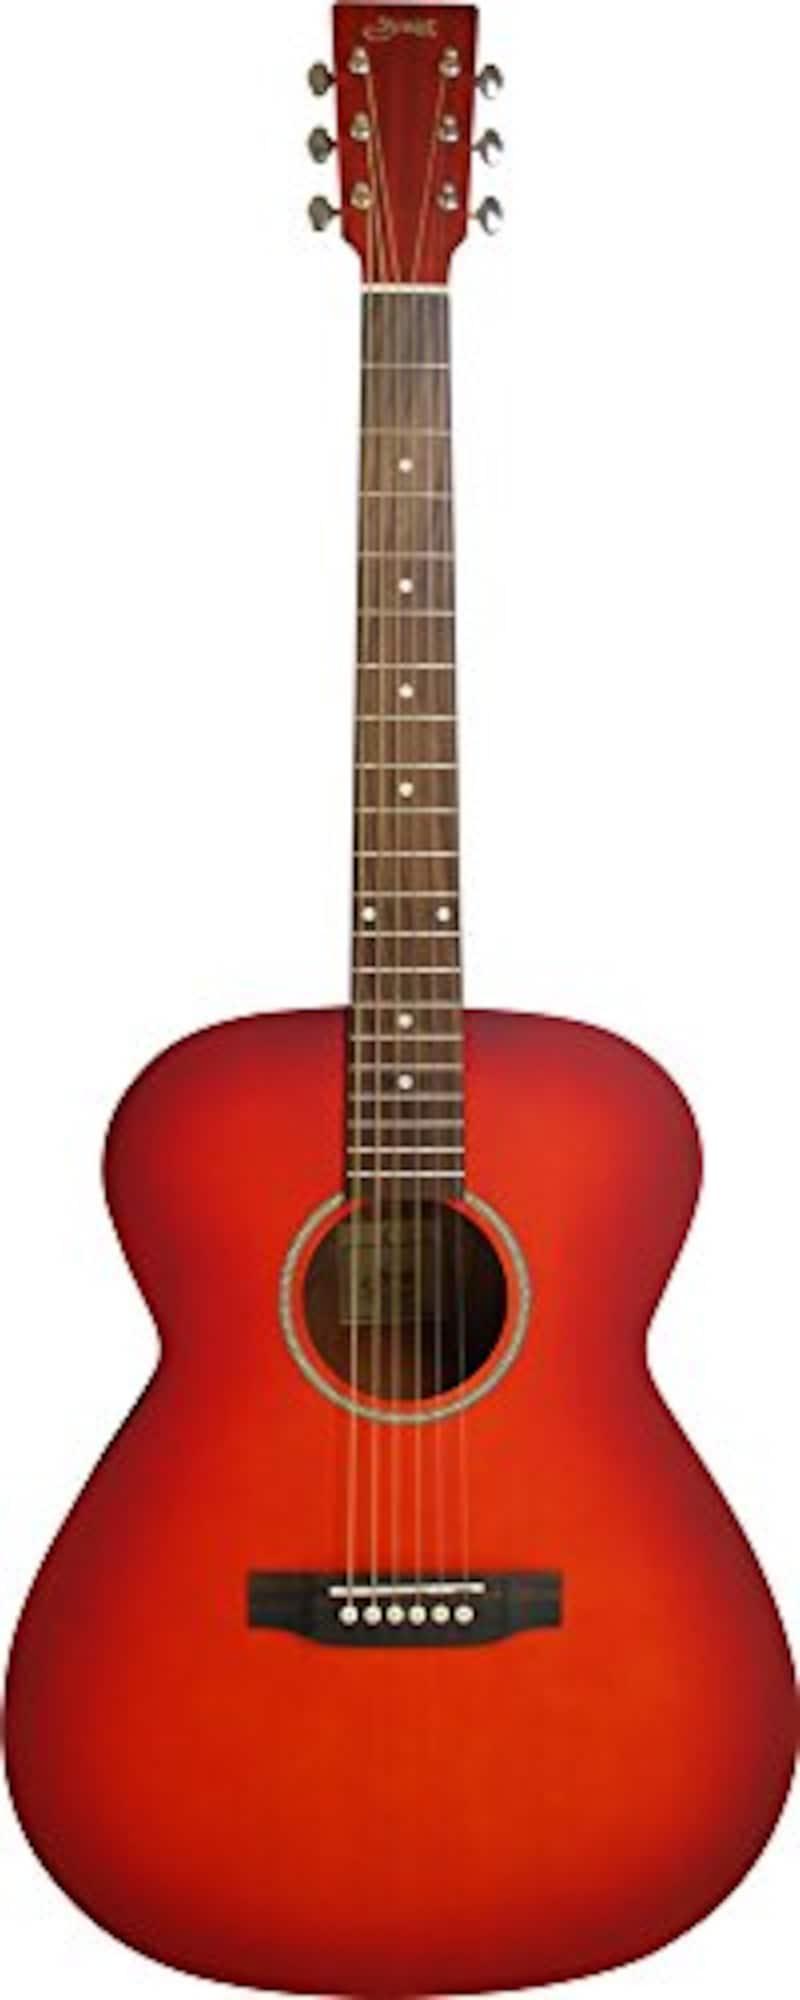 S.Yairi(ヤイリ),Limited Series アコースティックギター YF-04/CS